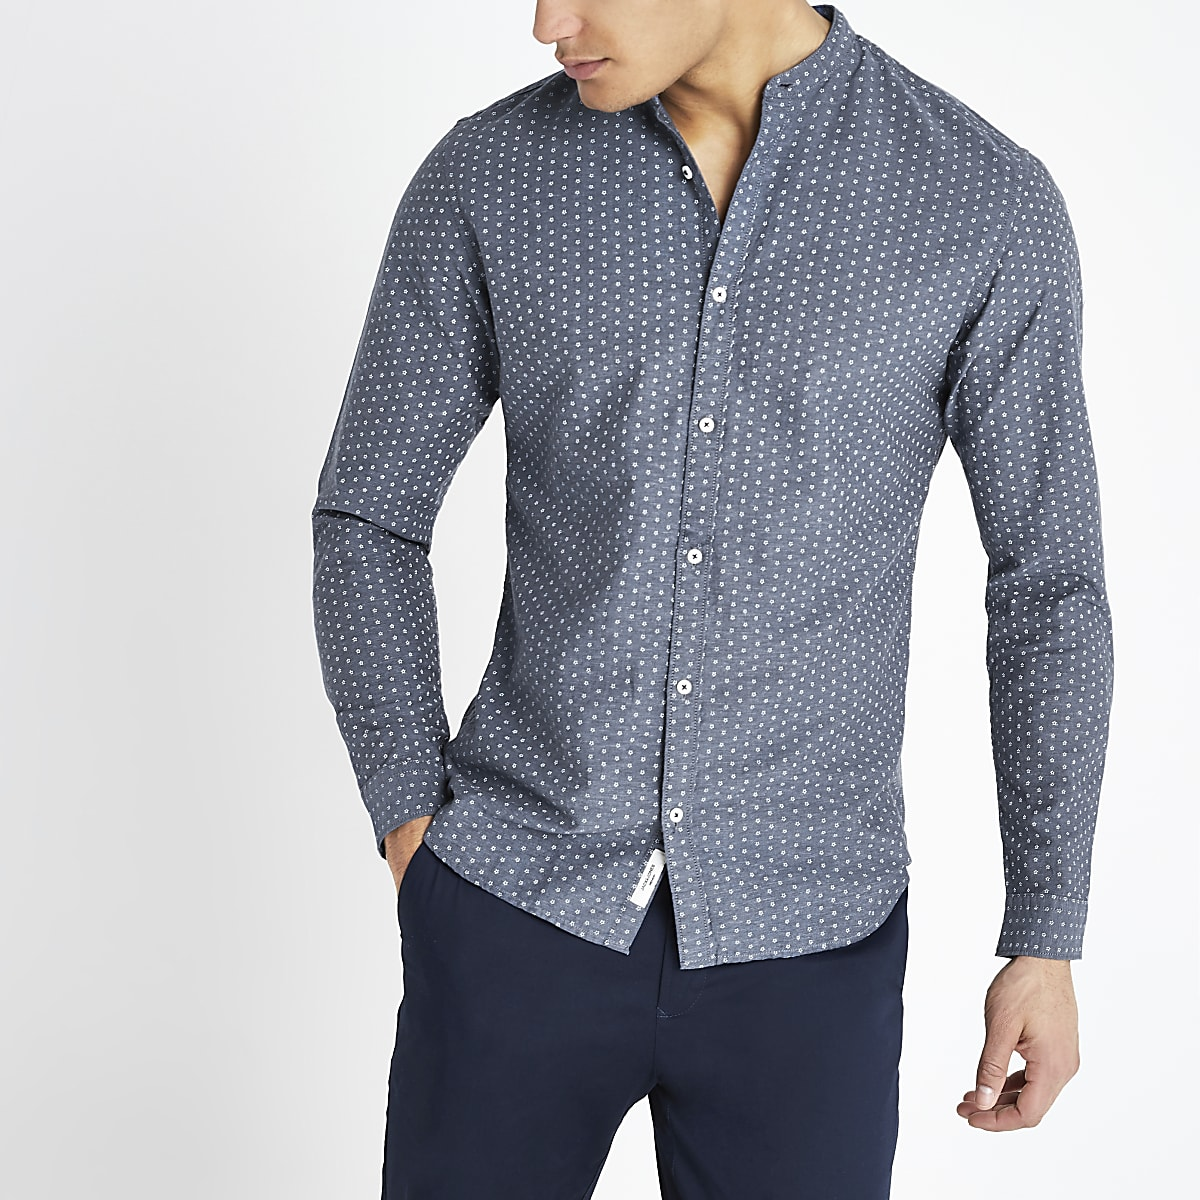 Jack and Jones navy printed slim fit shirt